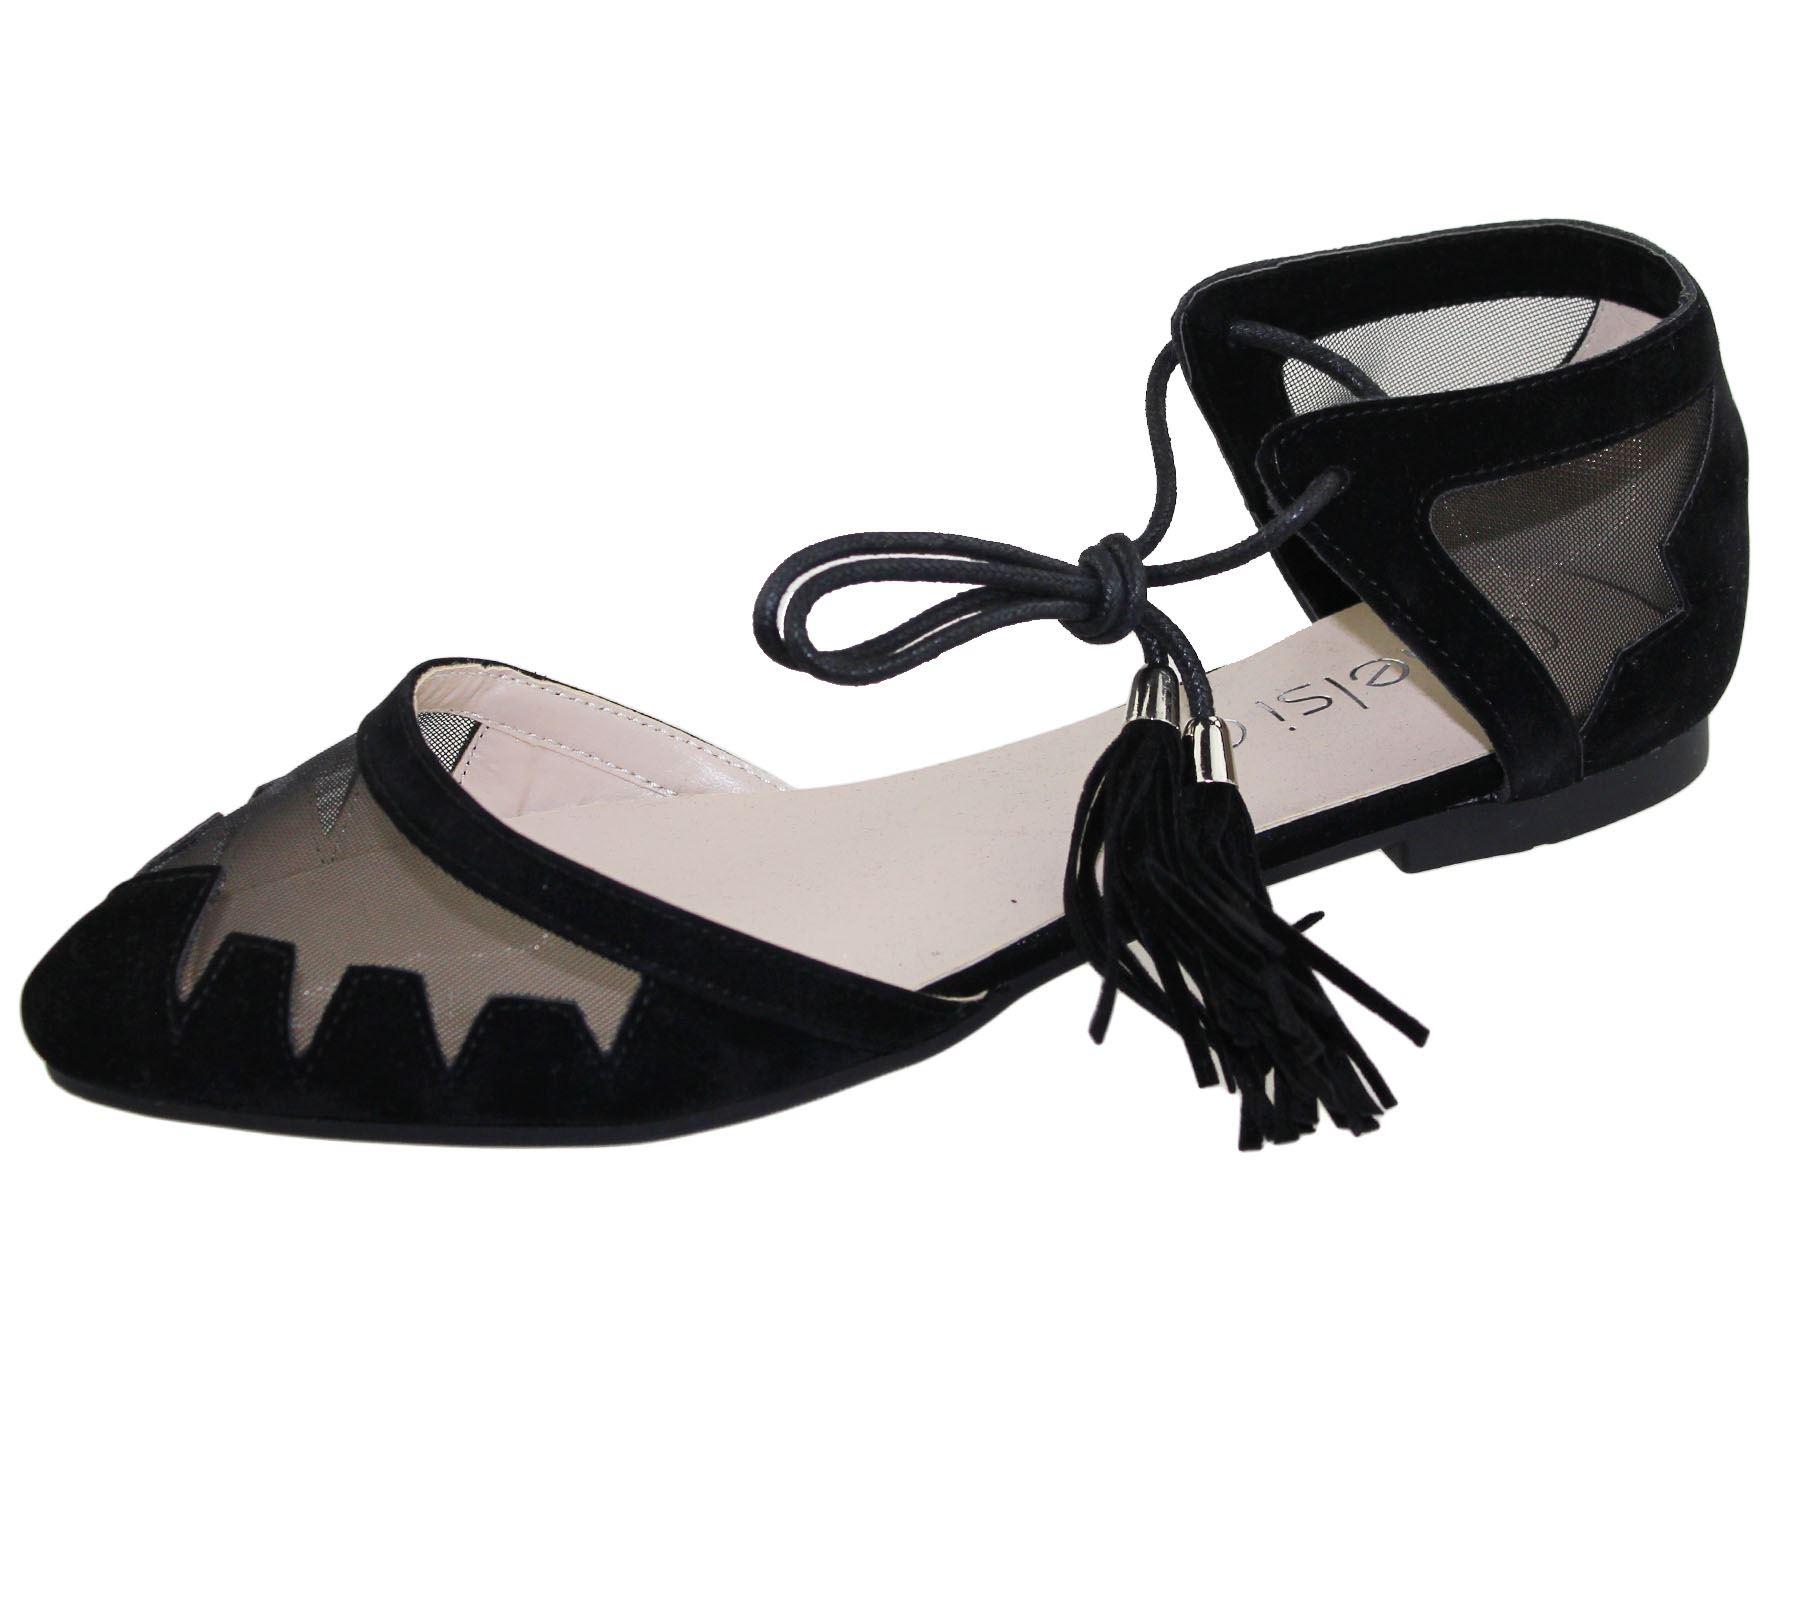 Womens-Flat-Ballerina-Dolly-Pumps-Ballet-Ladies-Summer-Mesh-Tassel-Shoes-Sandals thumbnail 39